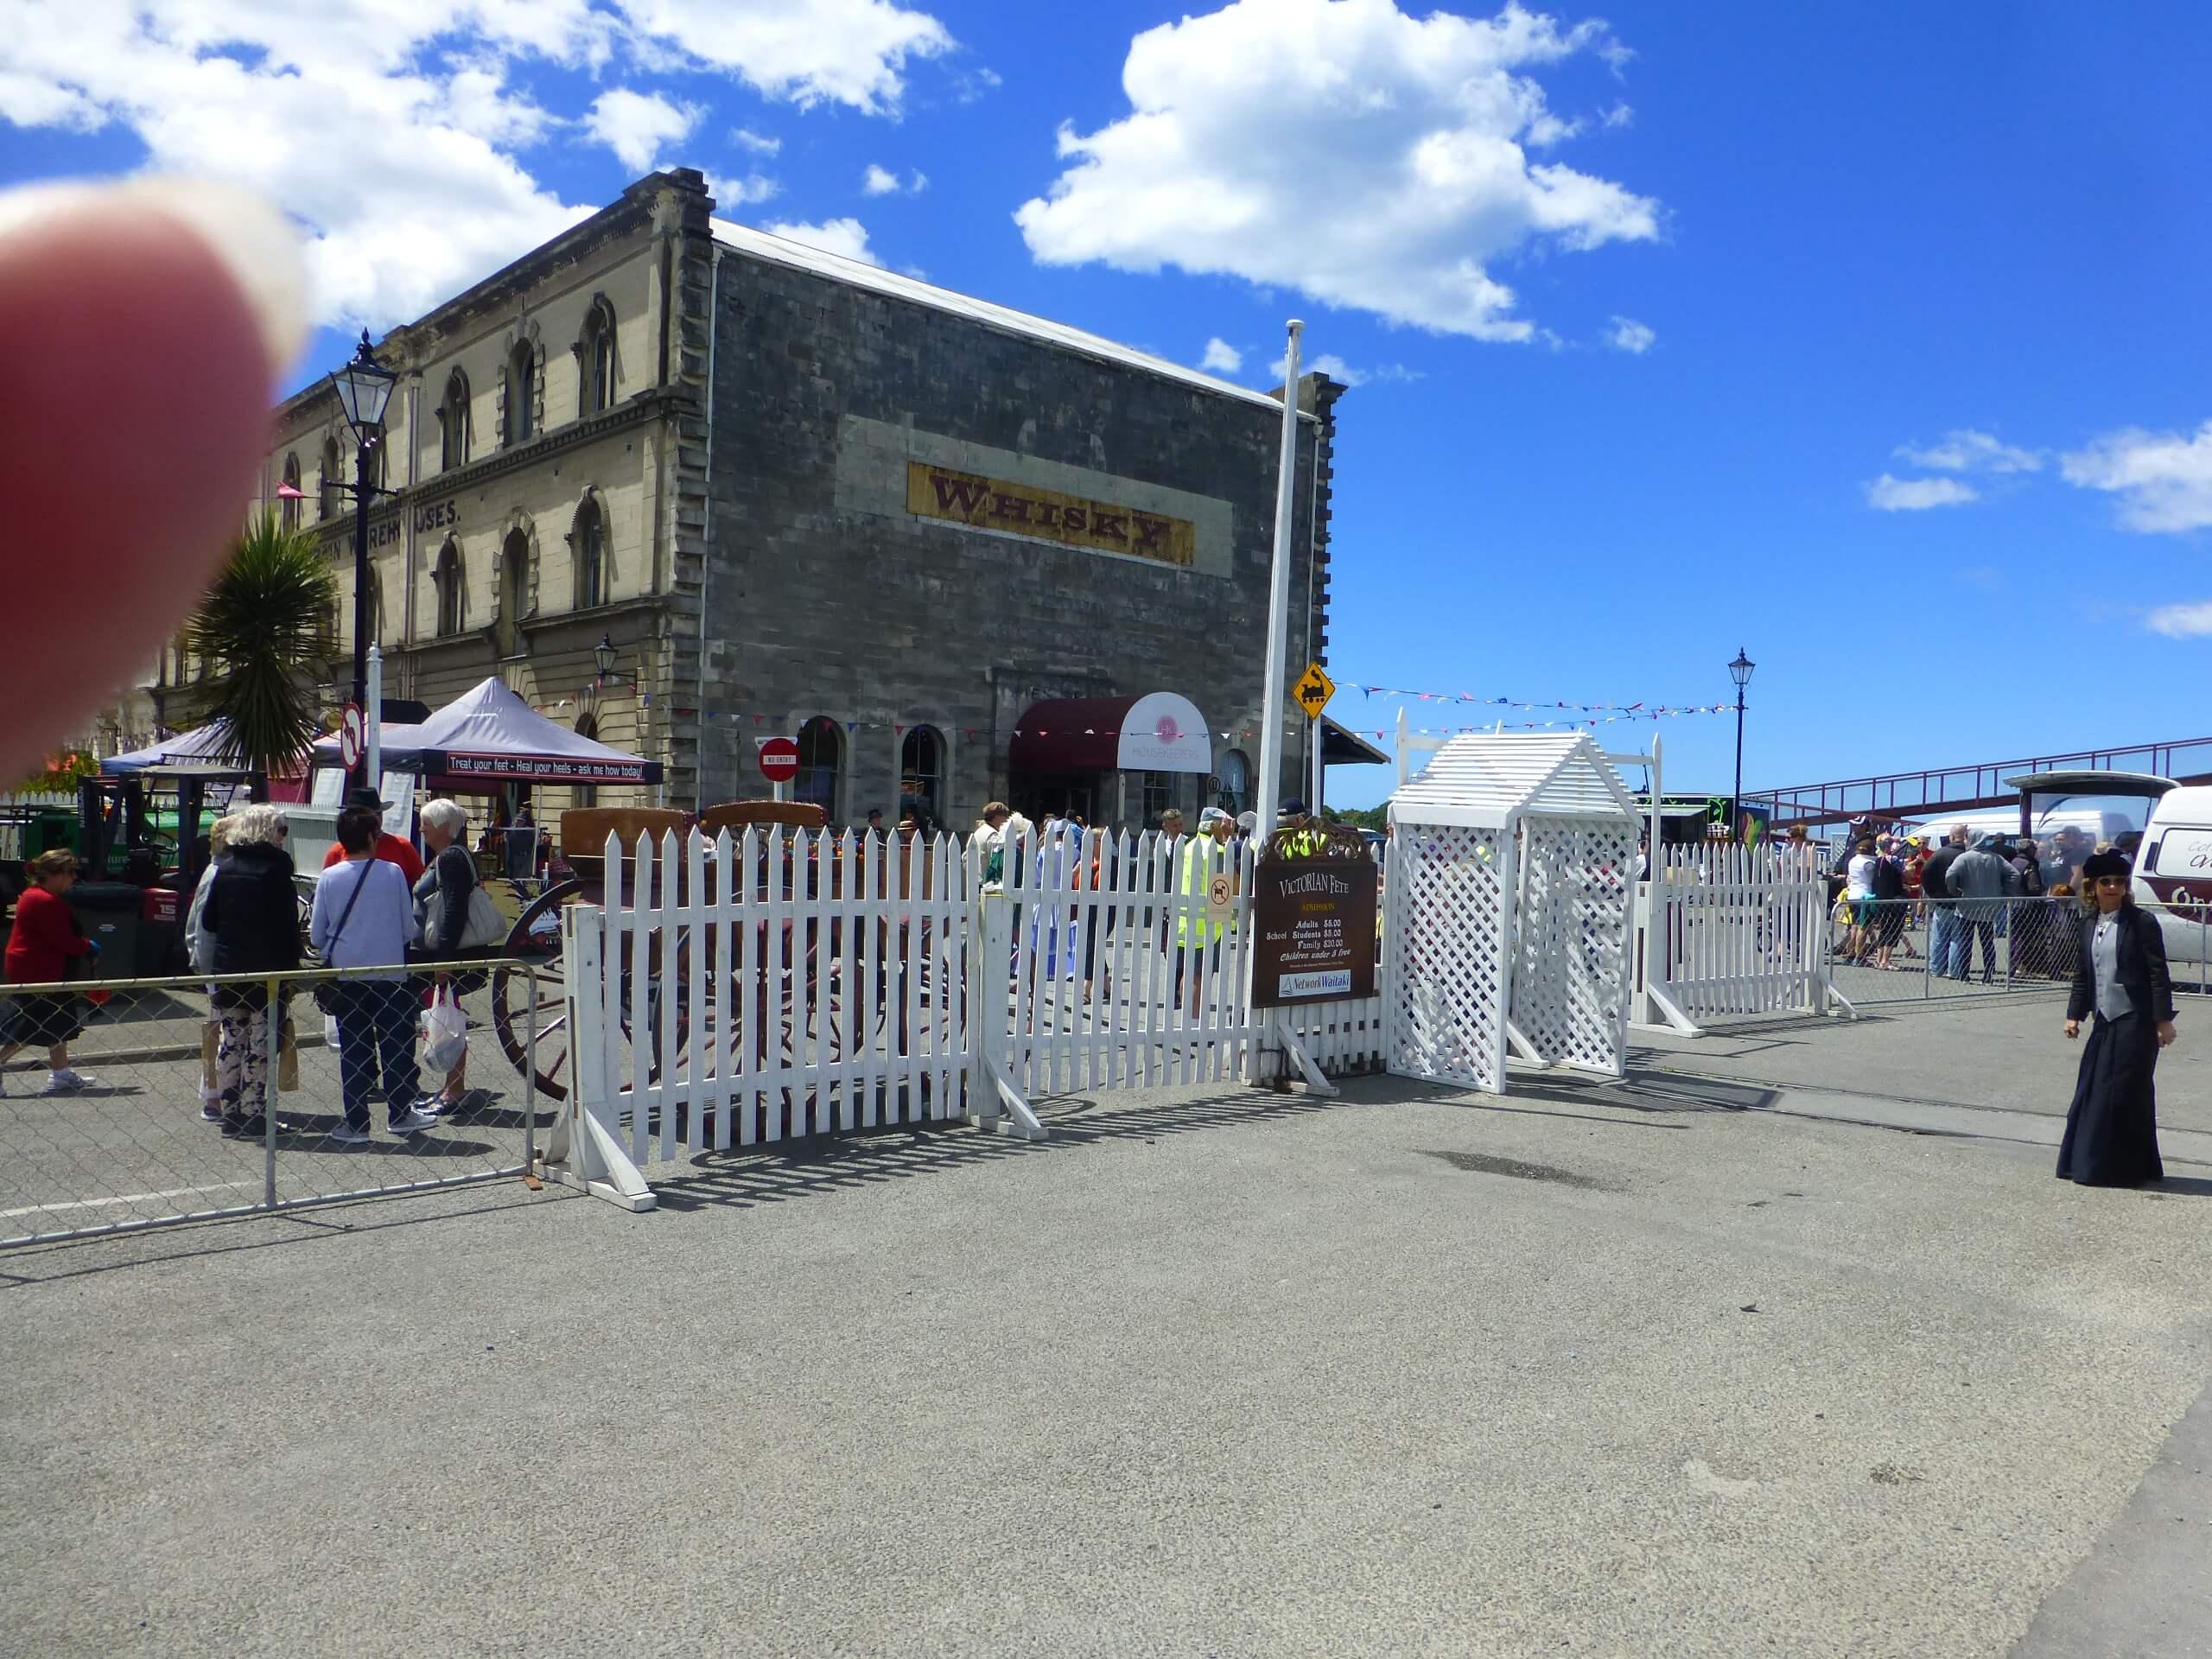 Eingang zum Viktorian Festival in Oamaru 5